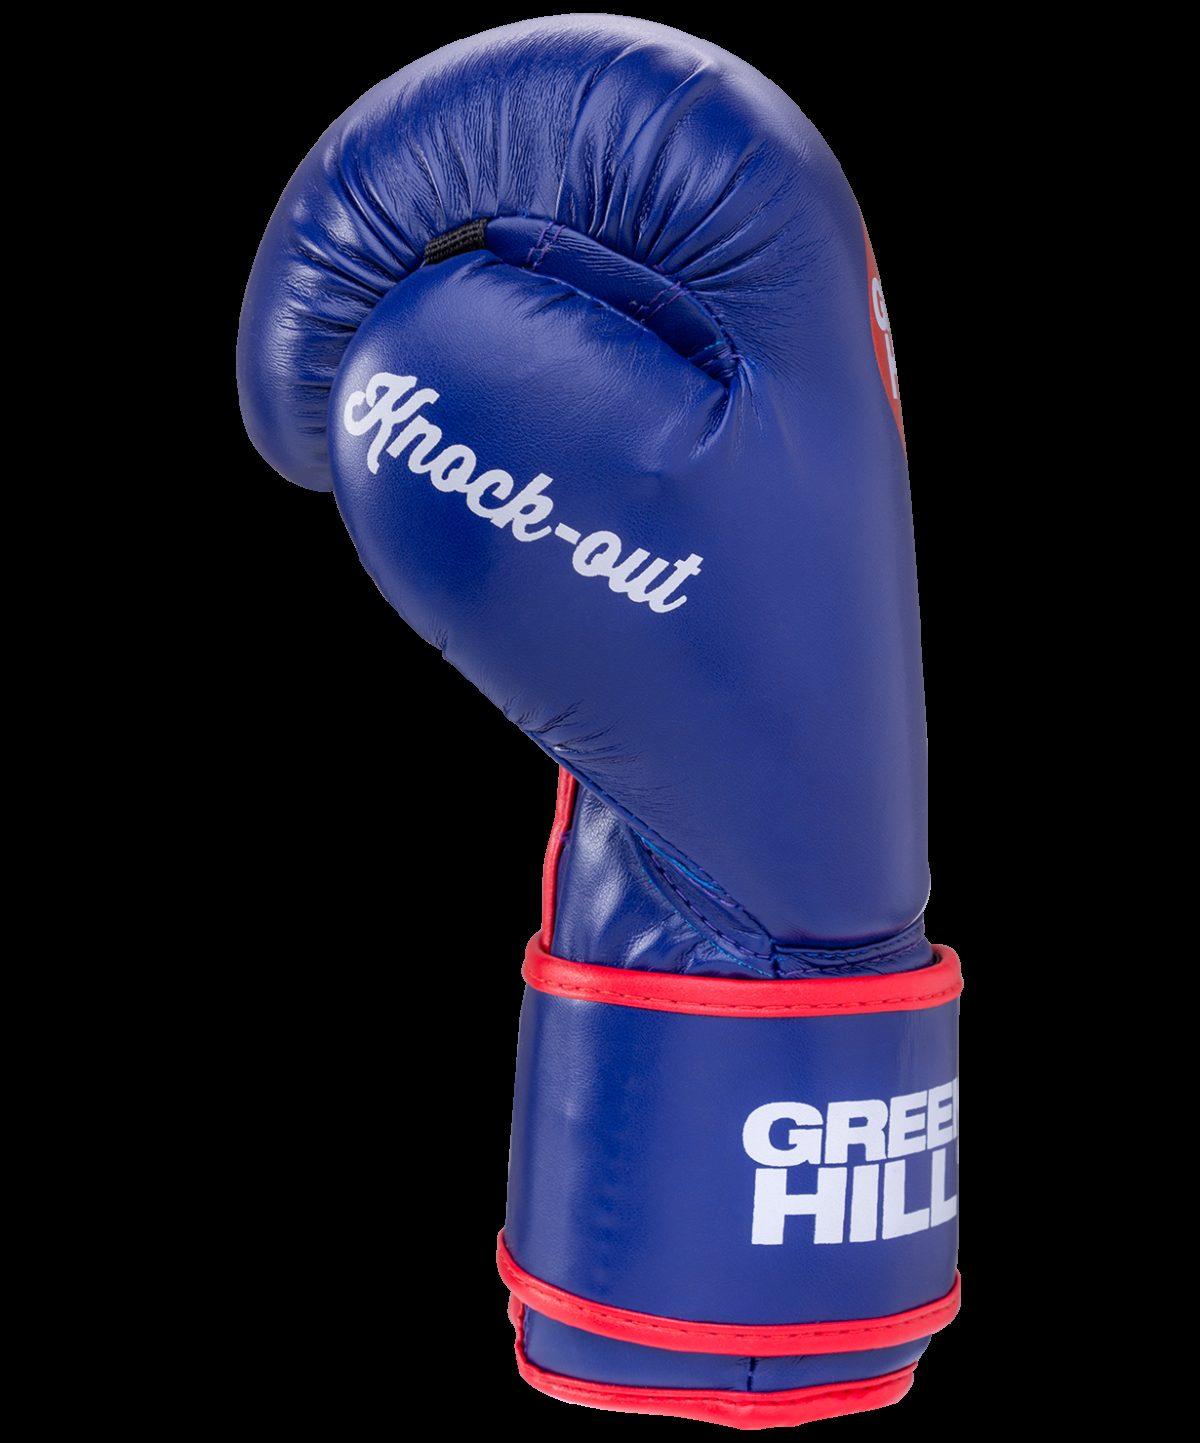 GREEN HILL Перчатки боксерские 10 oz Knockout  BGK-2266: синий - 3